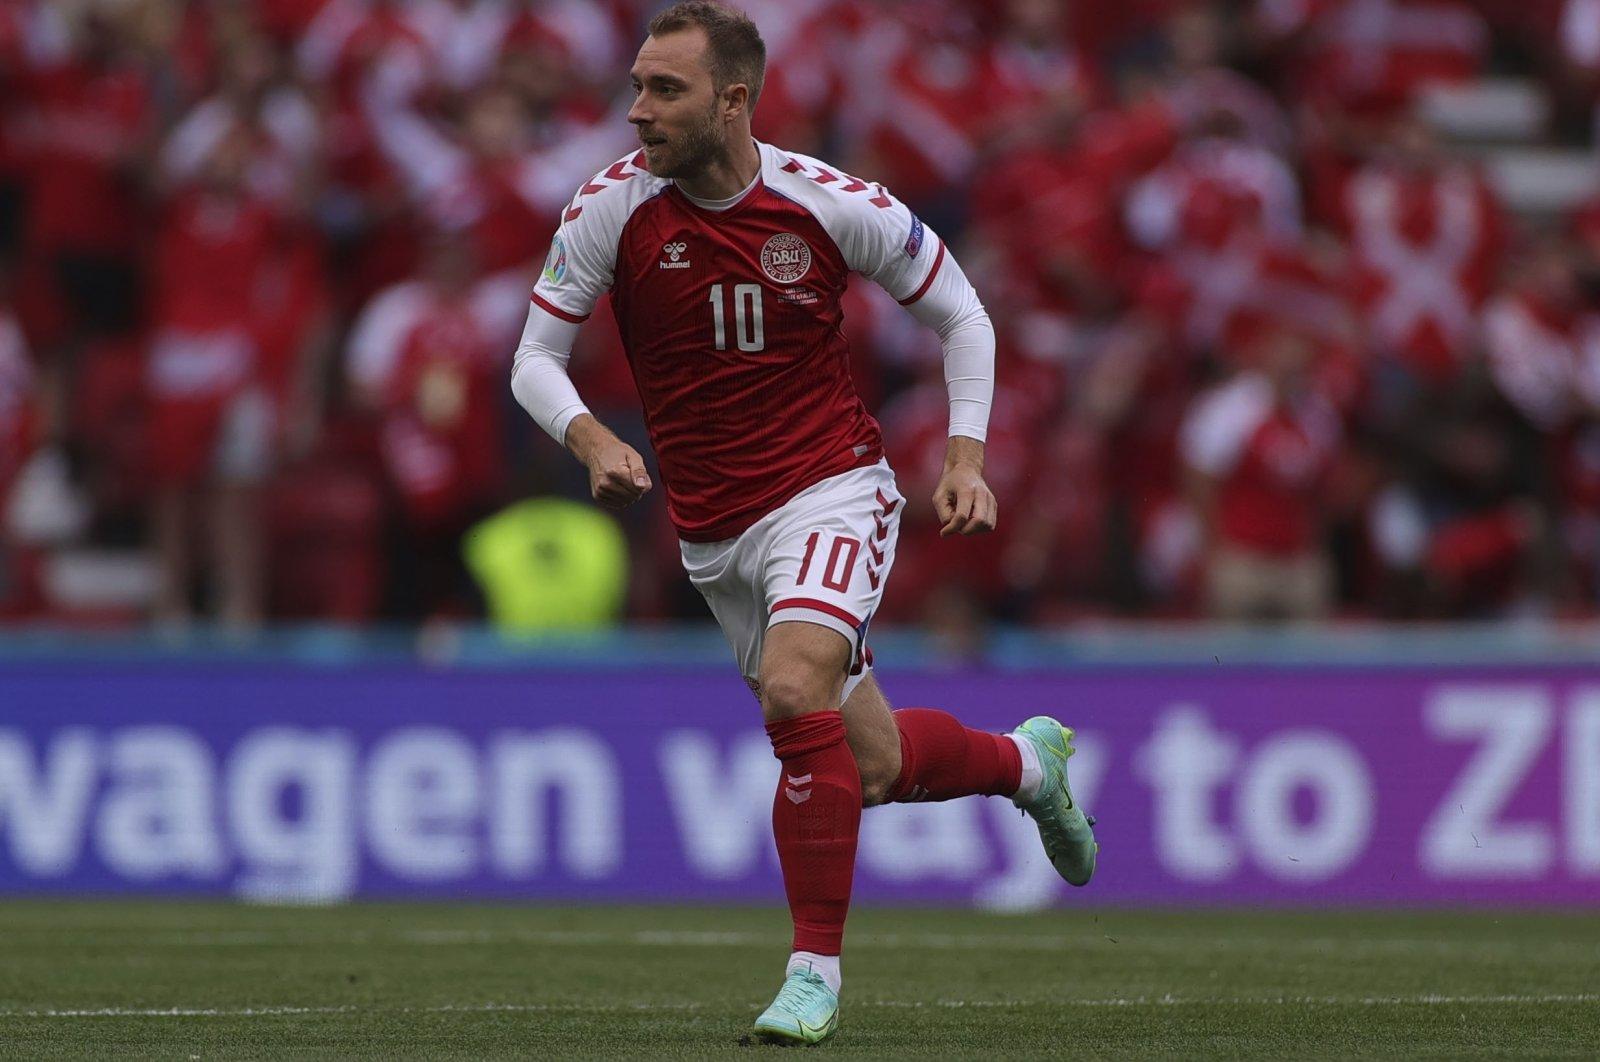 Denmark's Christian Eriksen runs during the Euro 2020 Group B match against Finland at Parken stadium in Copenhagen, Denmark, June 12, 2021. (AP Photo)